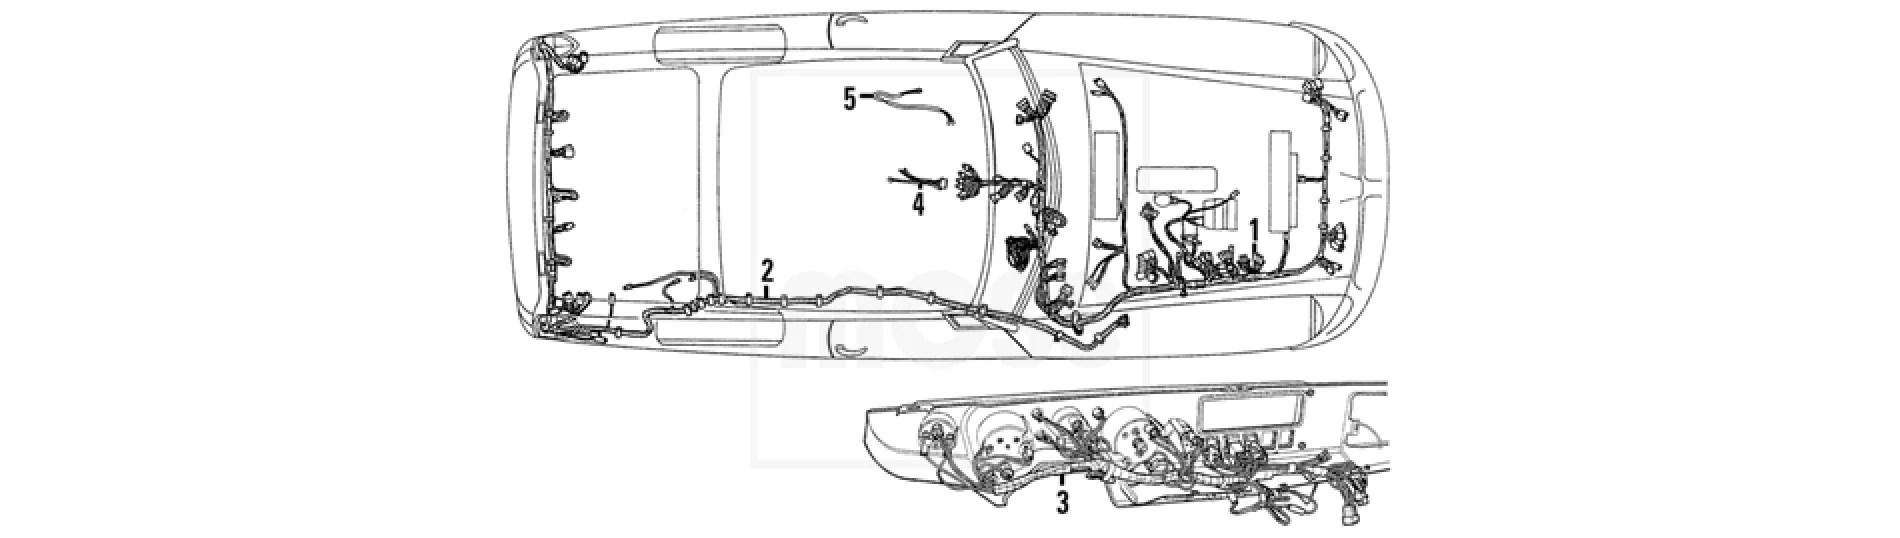 medium resolution of  mgb wiring harness wiring diagram expert on 1976 midget wiring diagram 1976 triumph